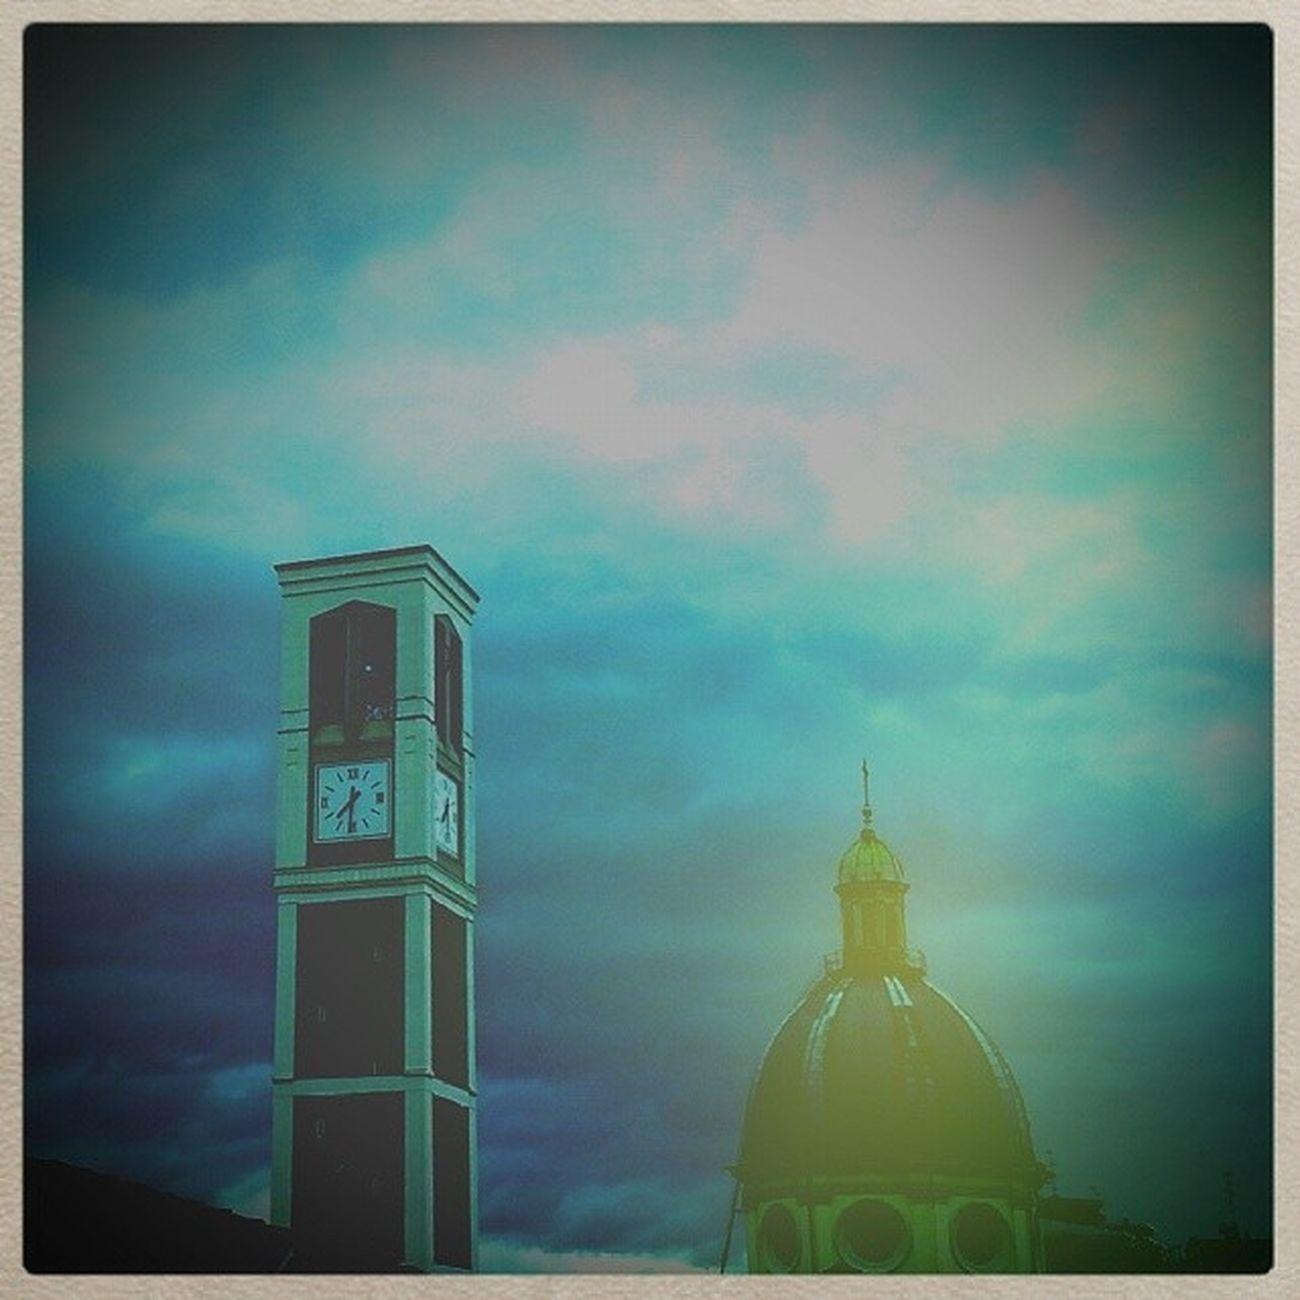 Clouds in Sesto 2 Ig_fotoitaliane Igers Ig_provincia igerslombardia igfriends_lombardia instagn0p instaitalia instagramitalia unopix cloouds cloudporn nuvole cupola sestosangiovanni XnRetro @xnview